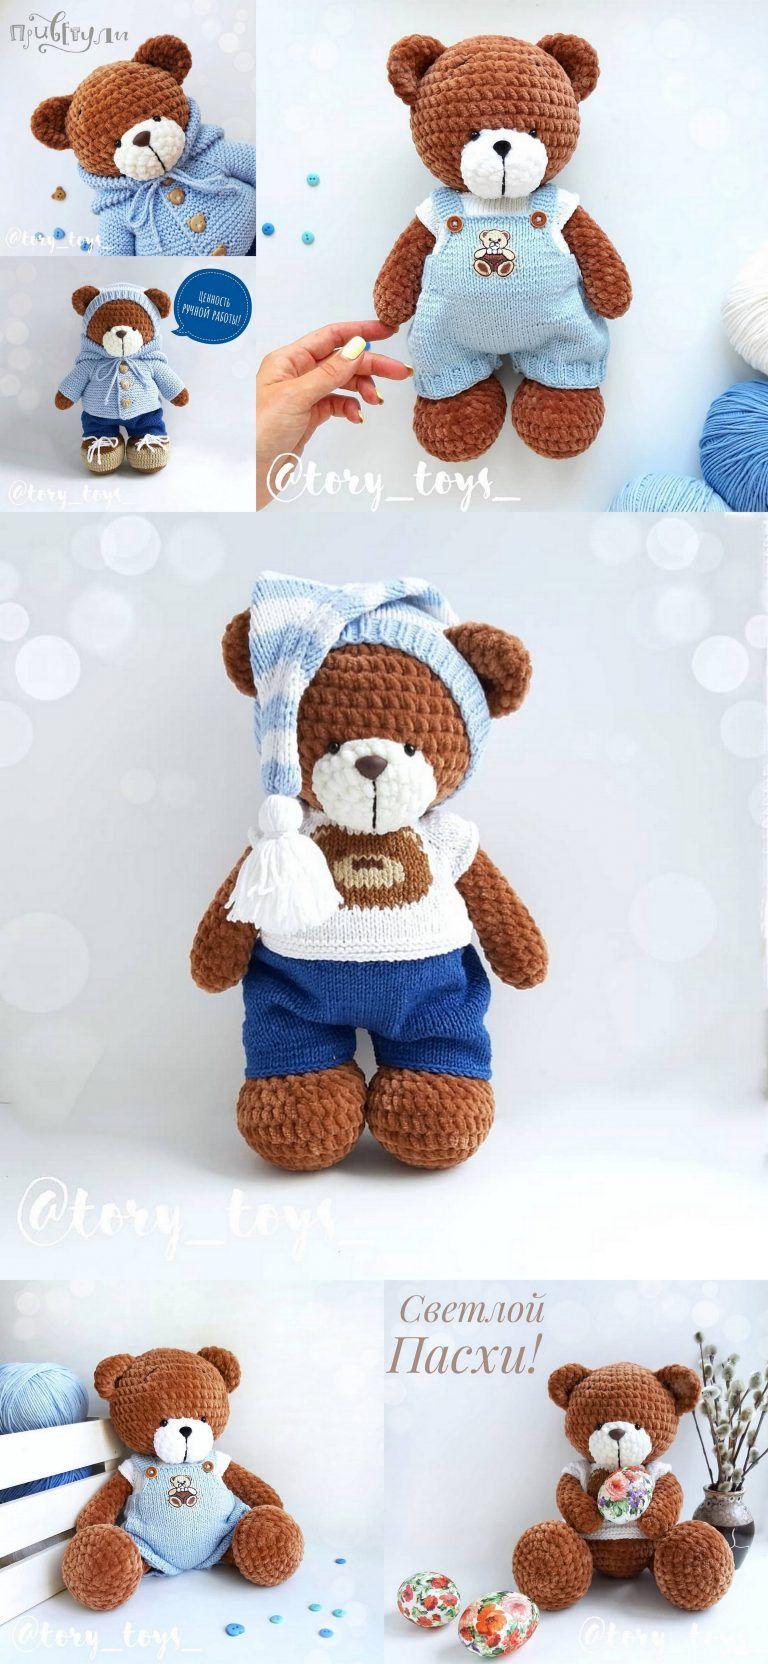 Crochet Pattern Baby Giraffe-Small Toy Crochet Pattern-Toy Giraffe ... | 1664x768